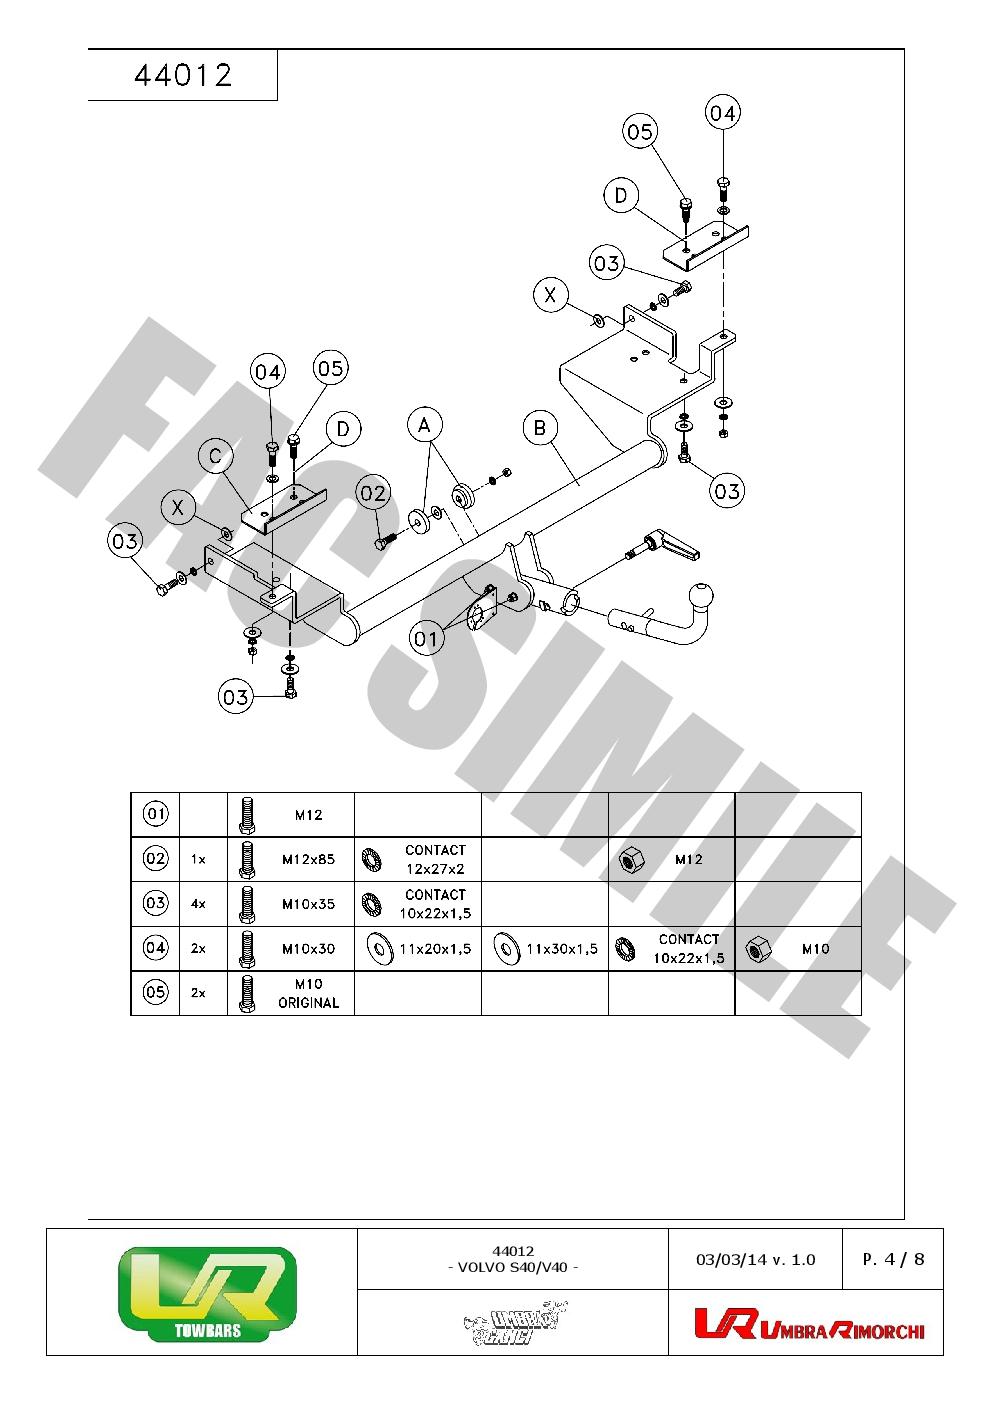 detach towbar   13p c2 wiring kit fits volvo v40 estate restyling 99